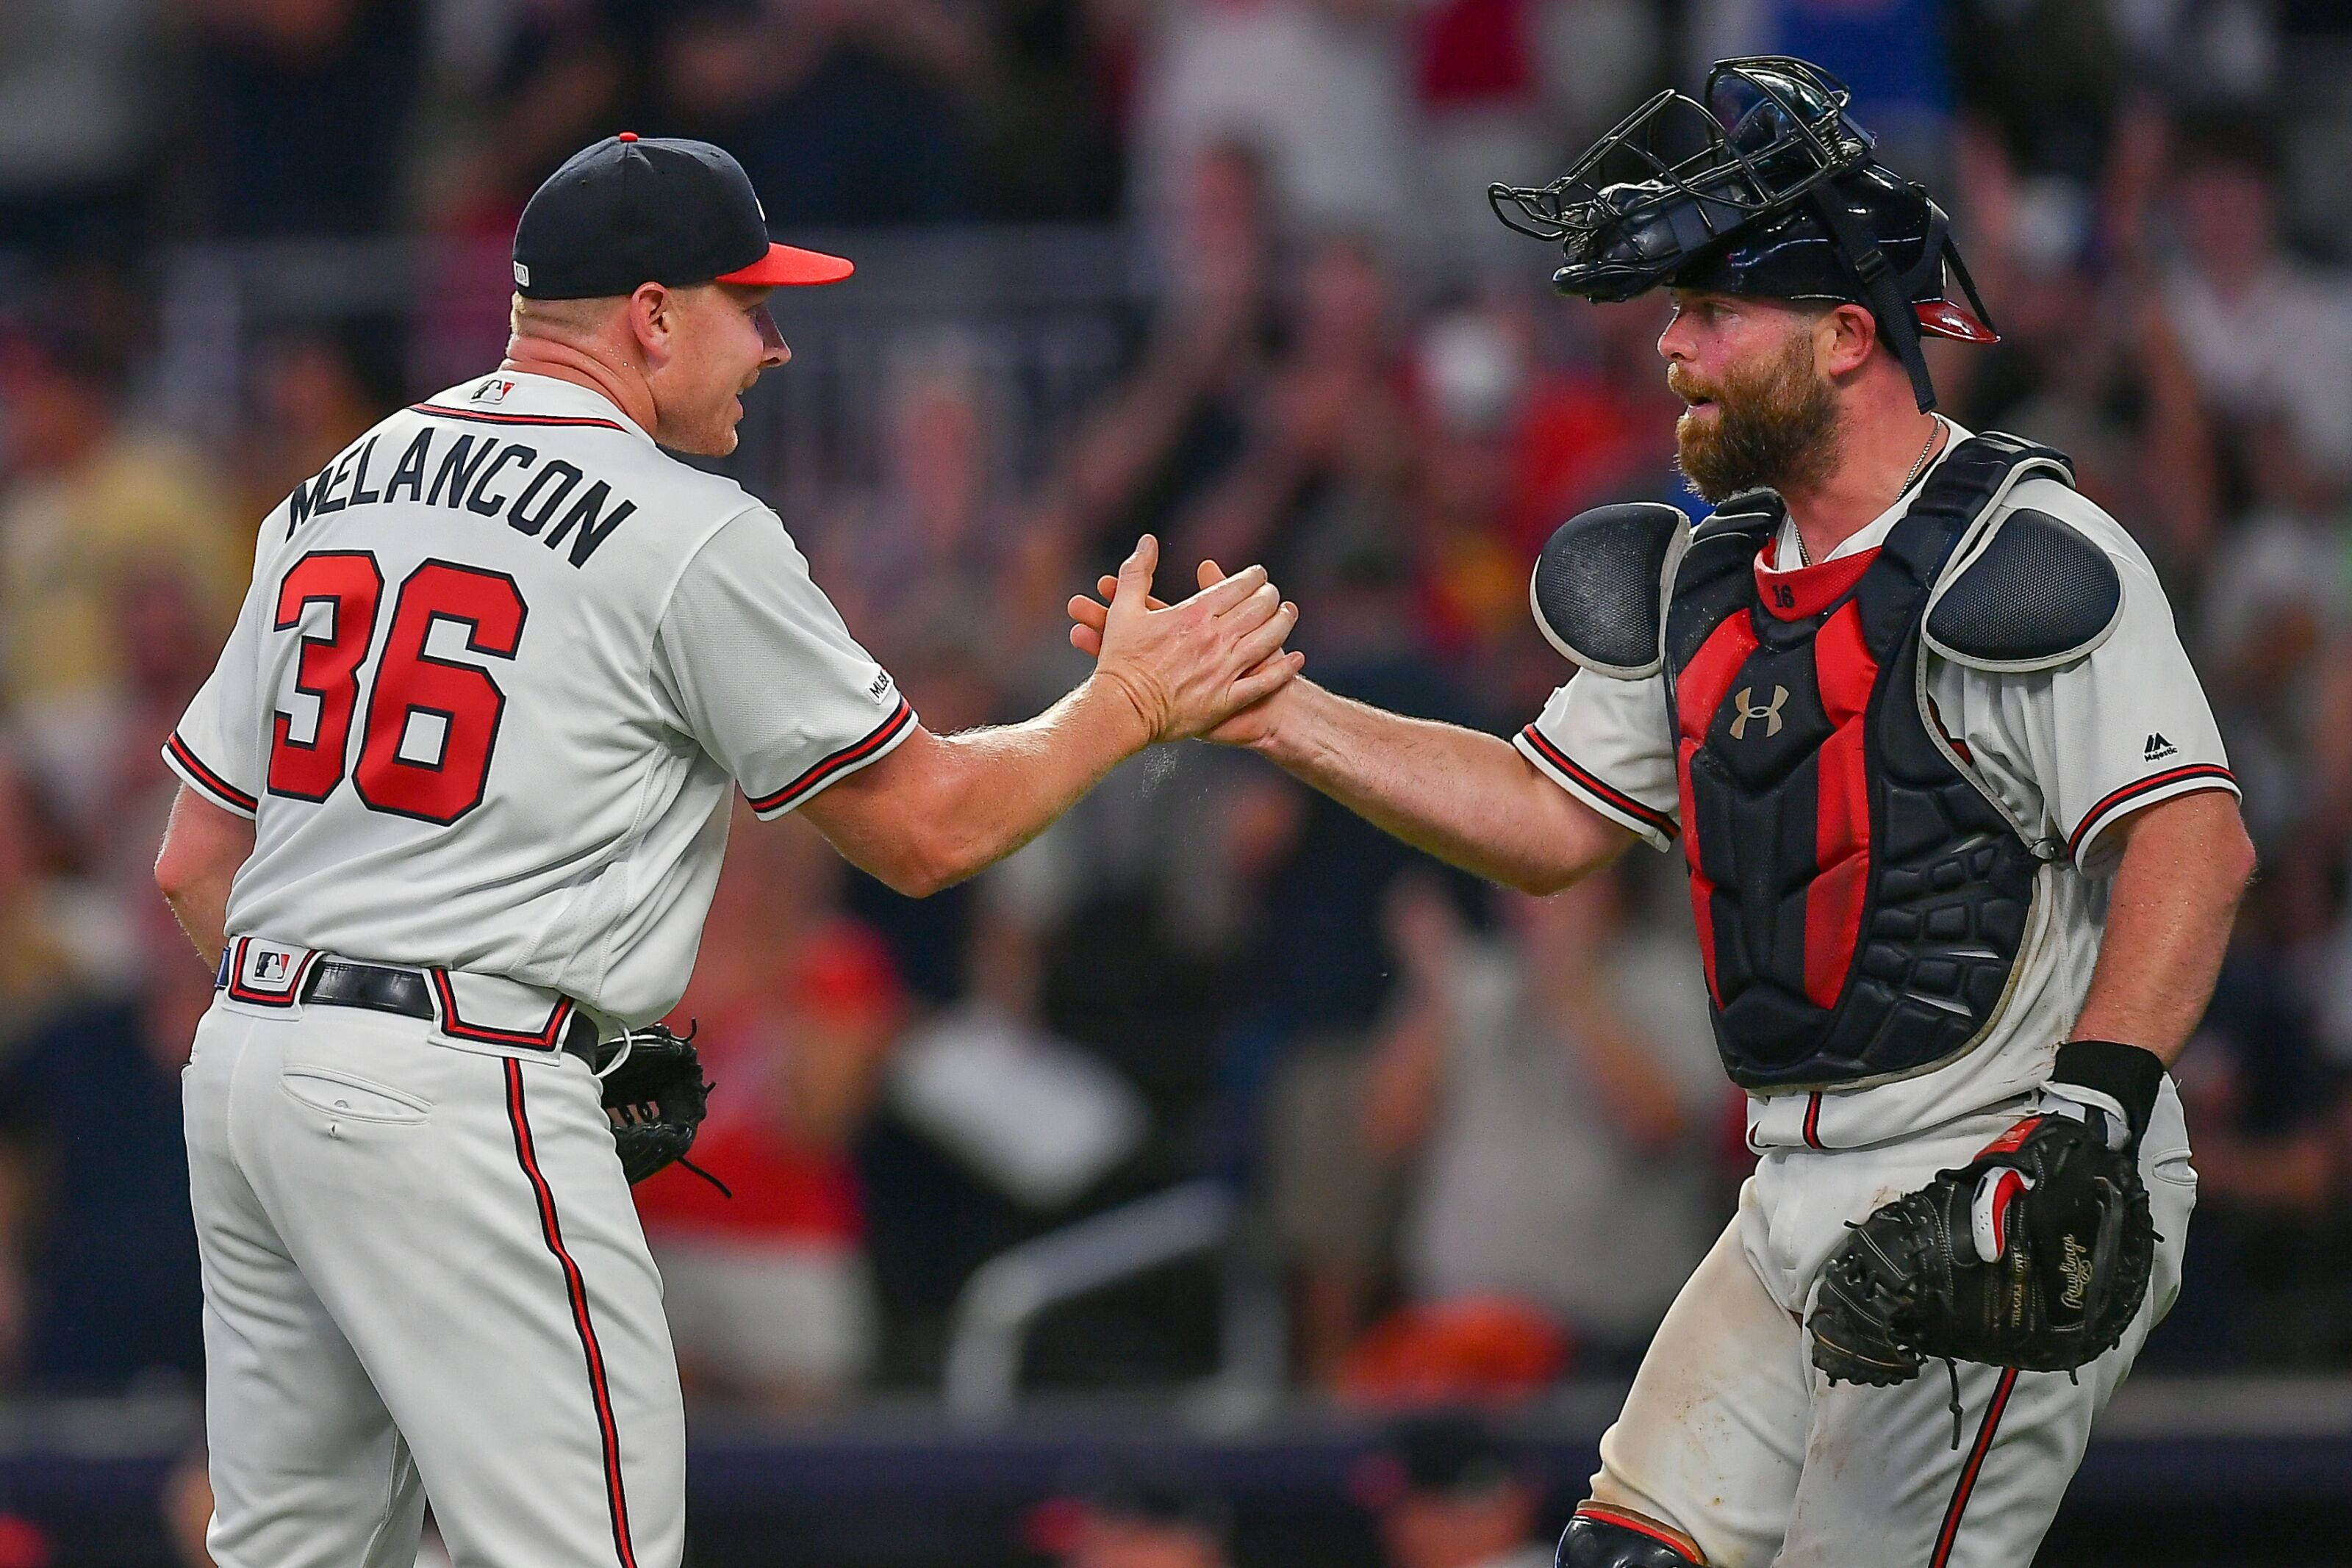 Atlanta Braves bullpen finally becoming an asset down the stretch